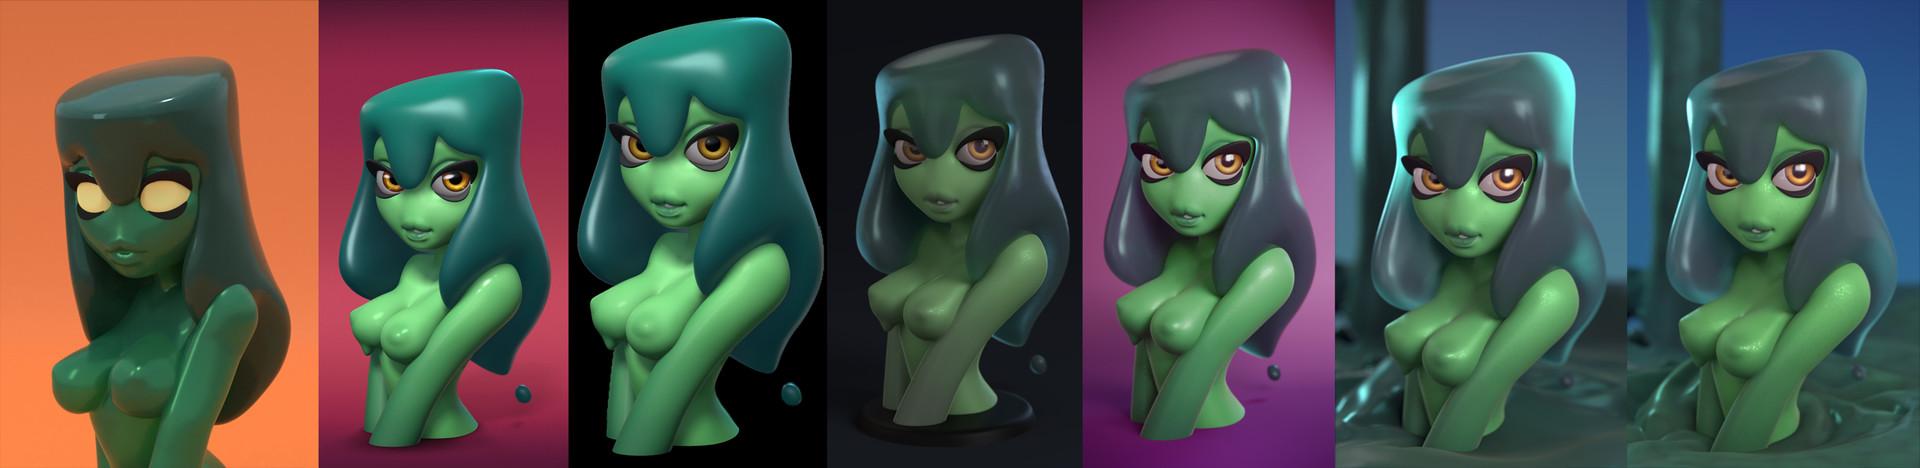 The paladin slime girl